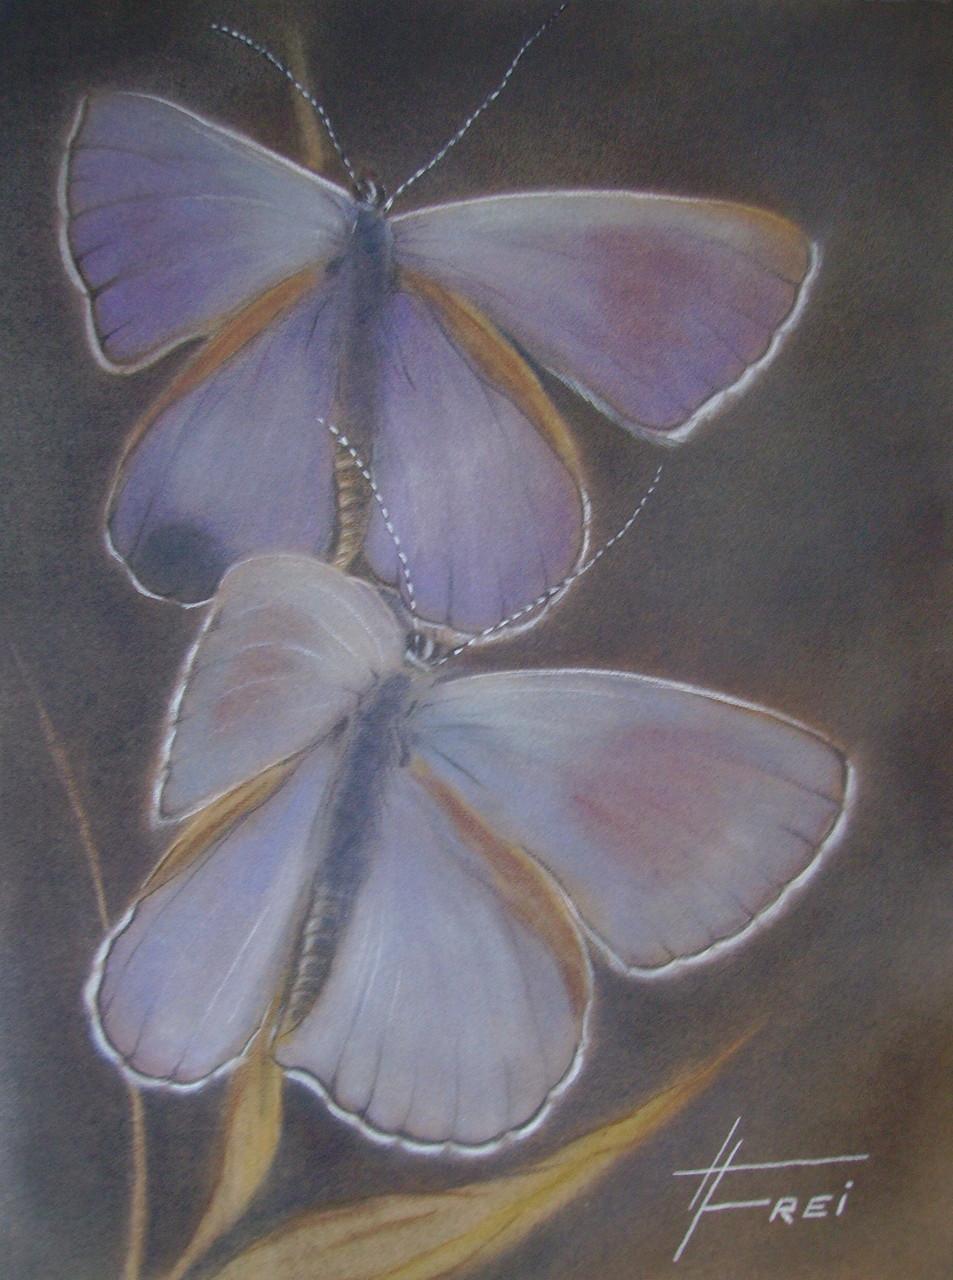 "ART HFrei - ""Butterfly"" - Pastell - 2006"